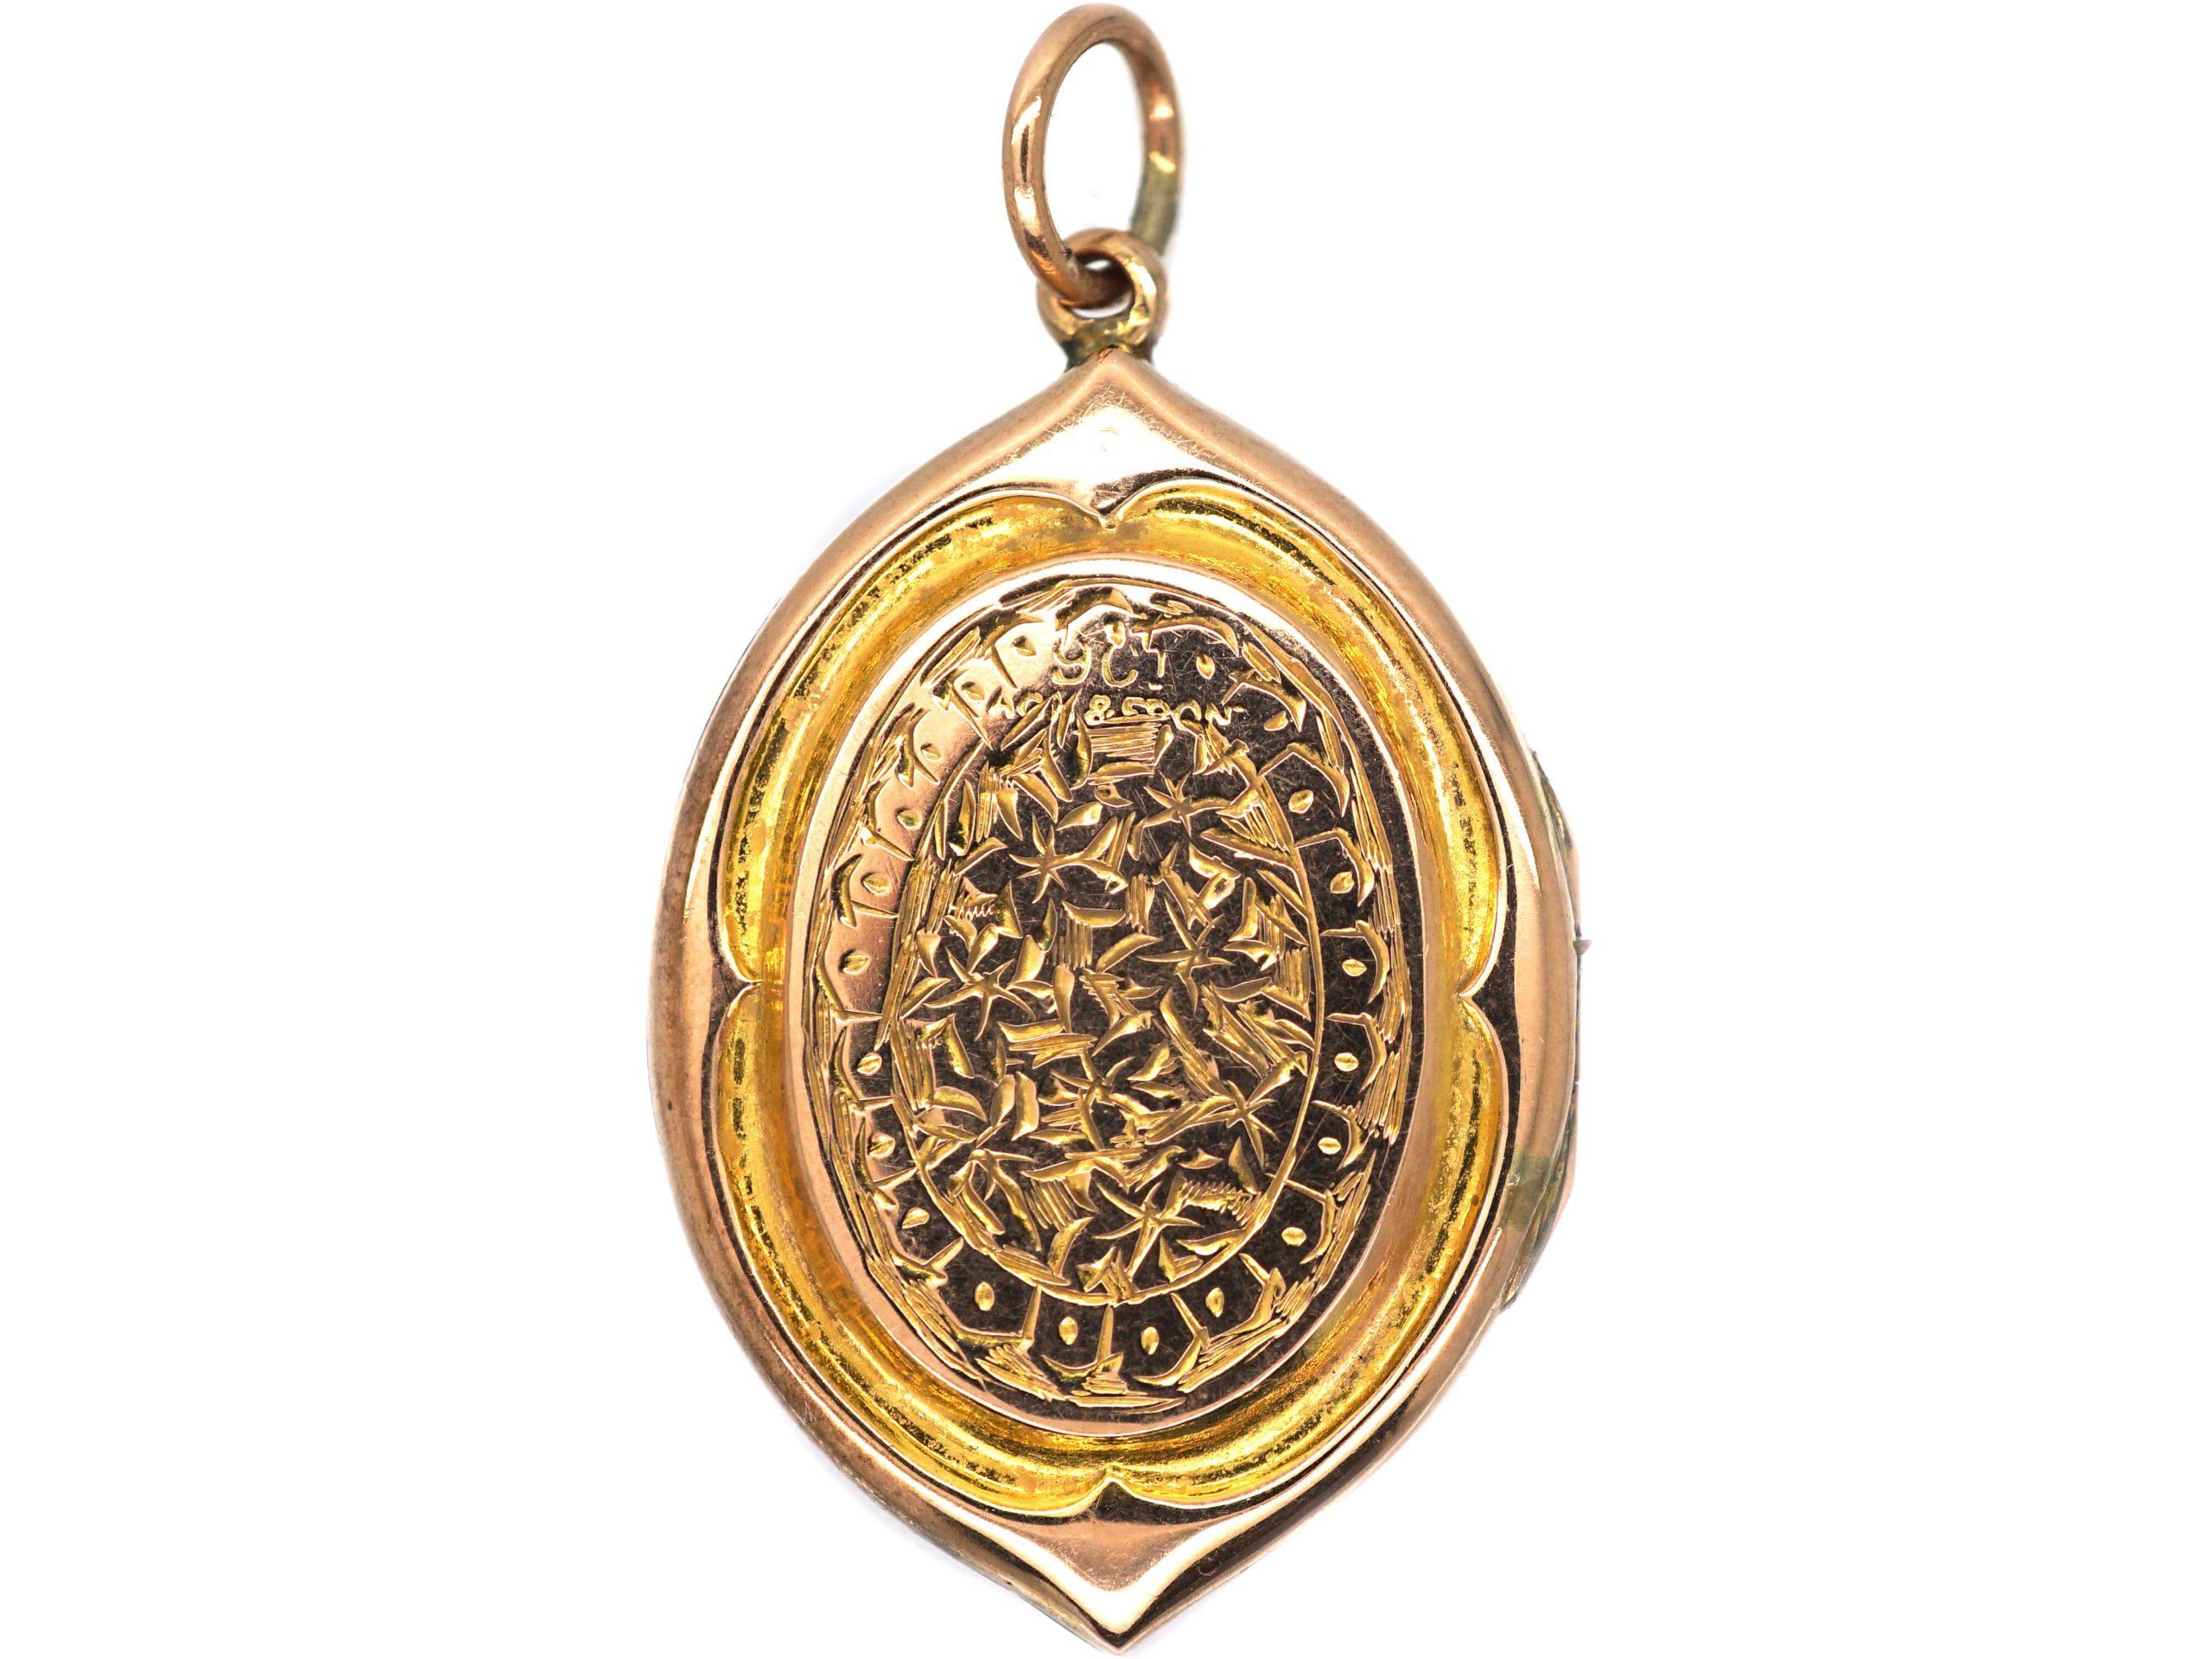 Edwardian 9ct Gold Back & Front Oval Shaped Locket